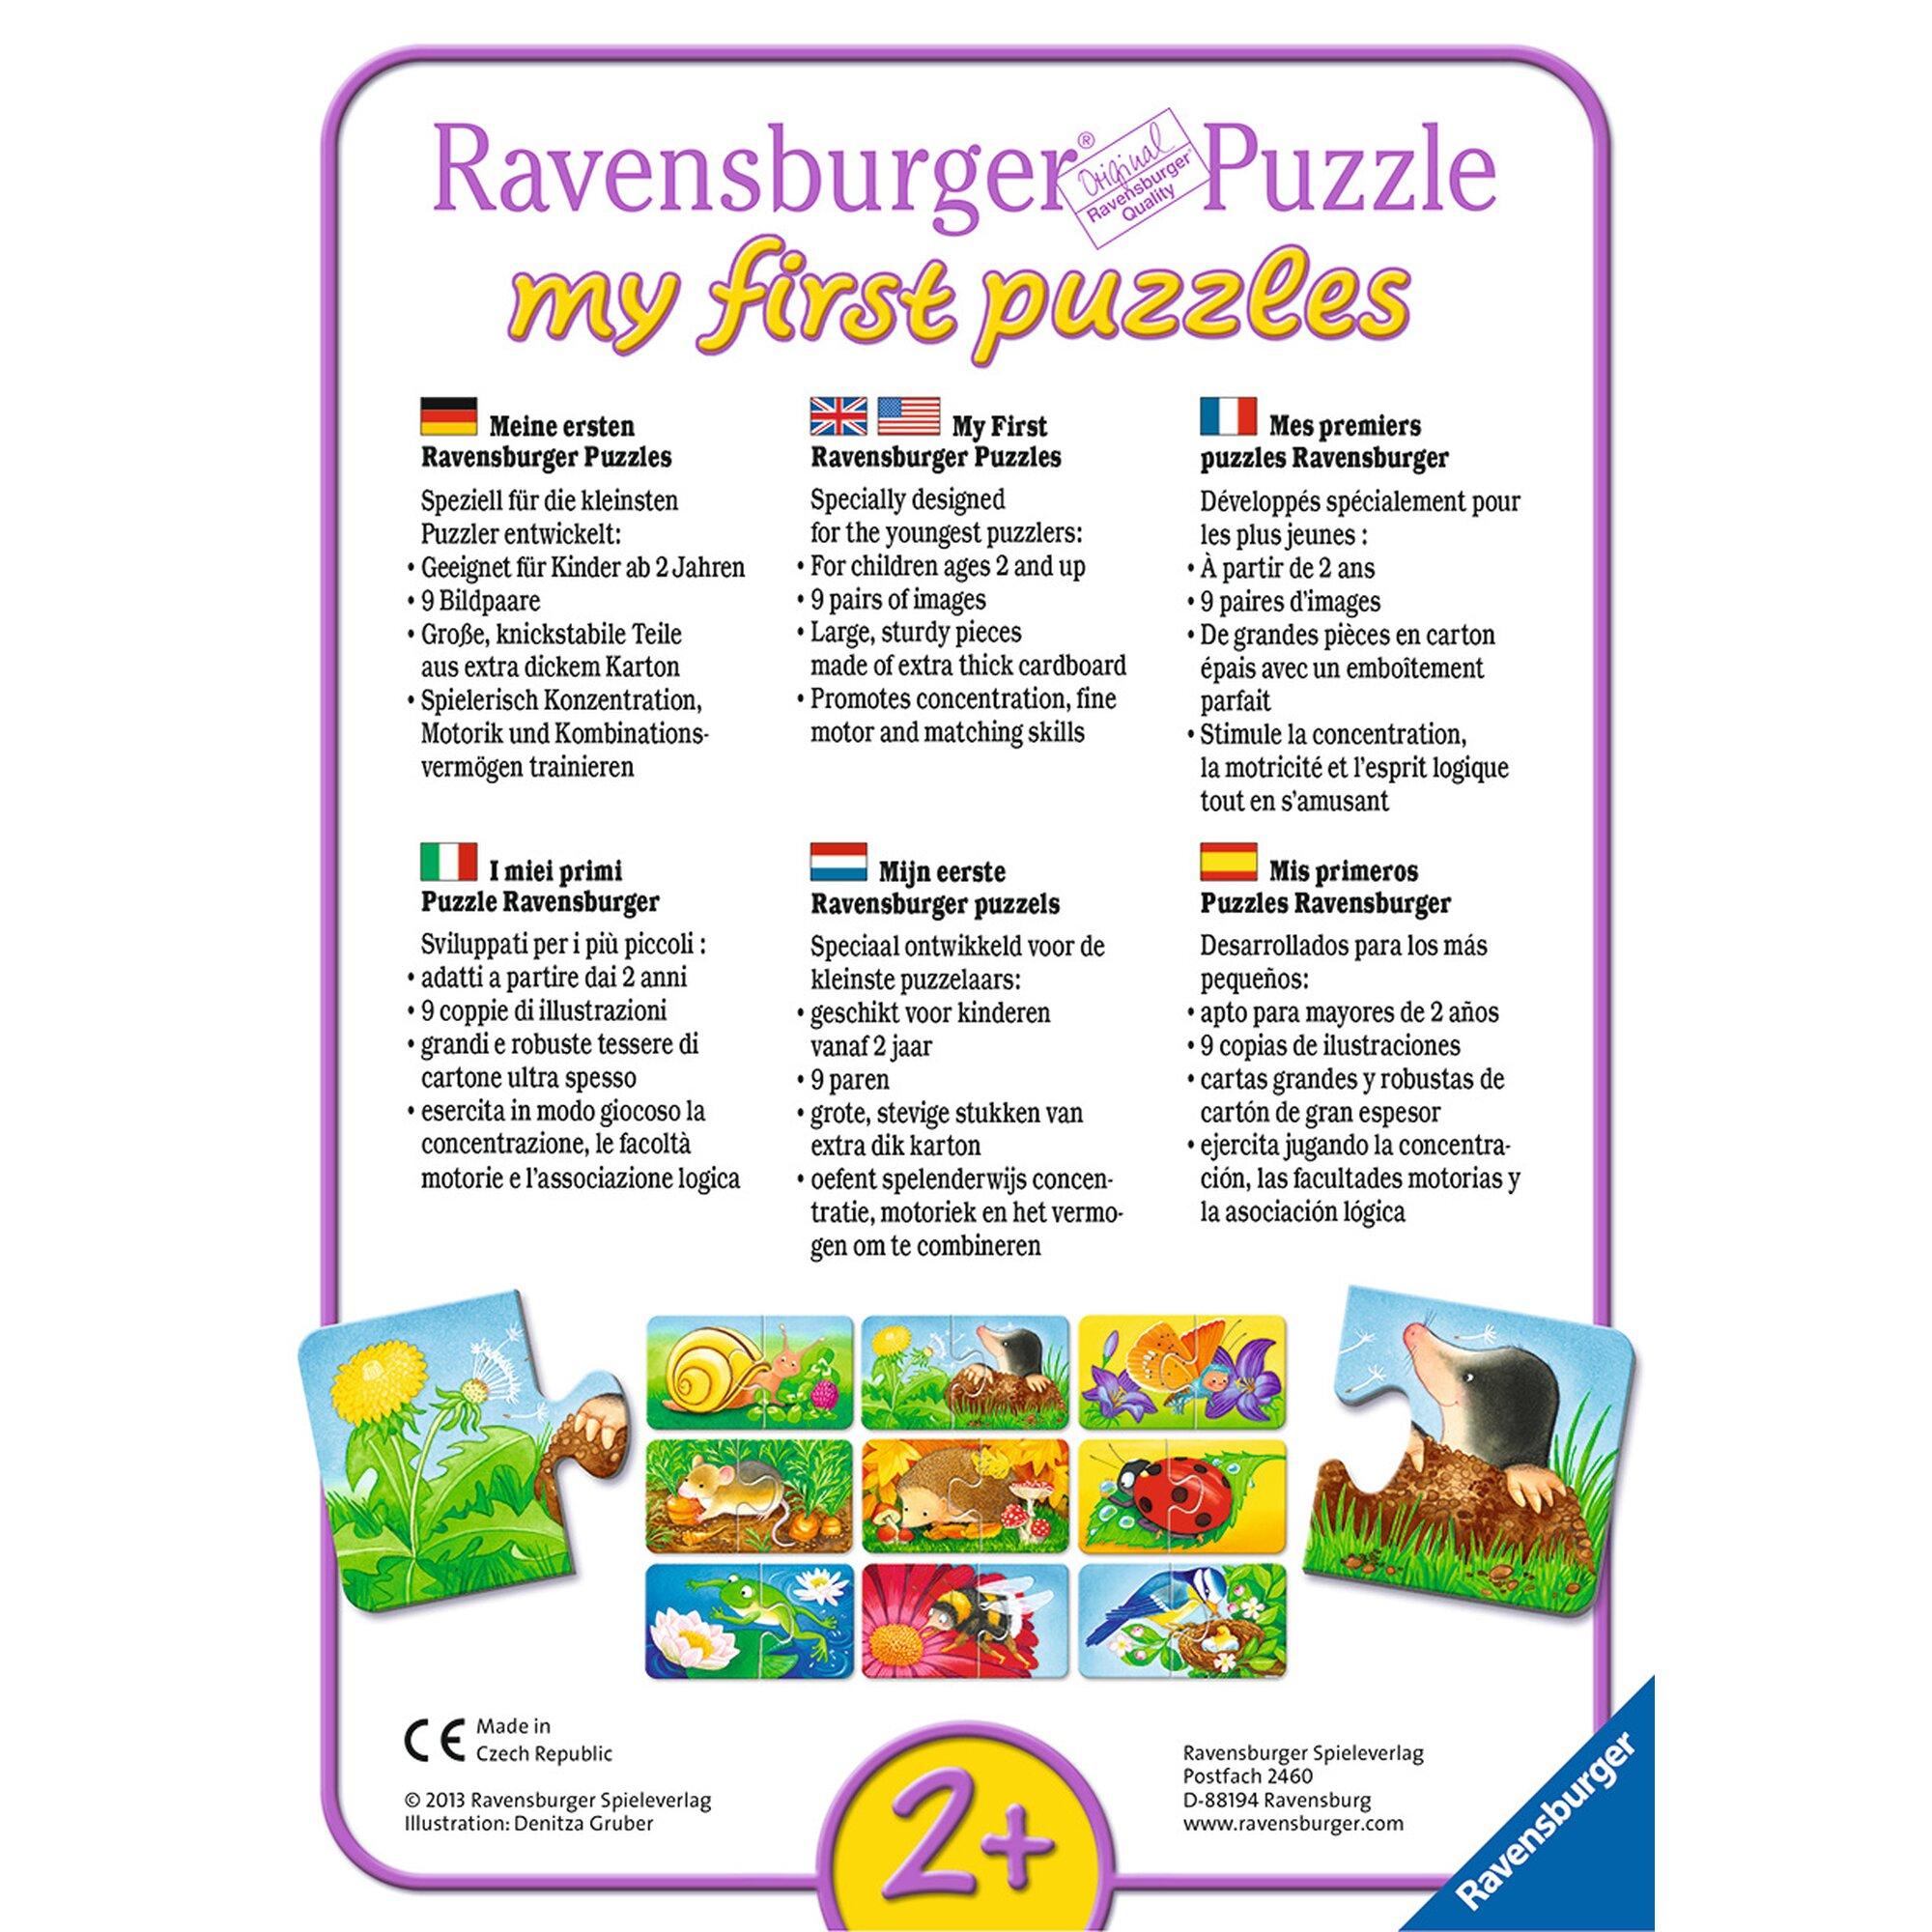 ravensburger-my-first-puzzles-9x2-2-teile-liebenswerte-tiere